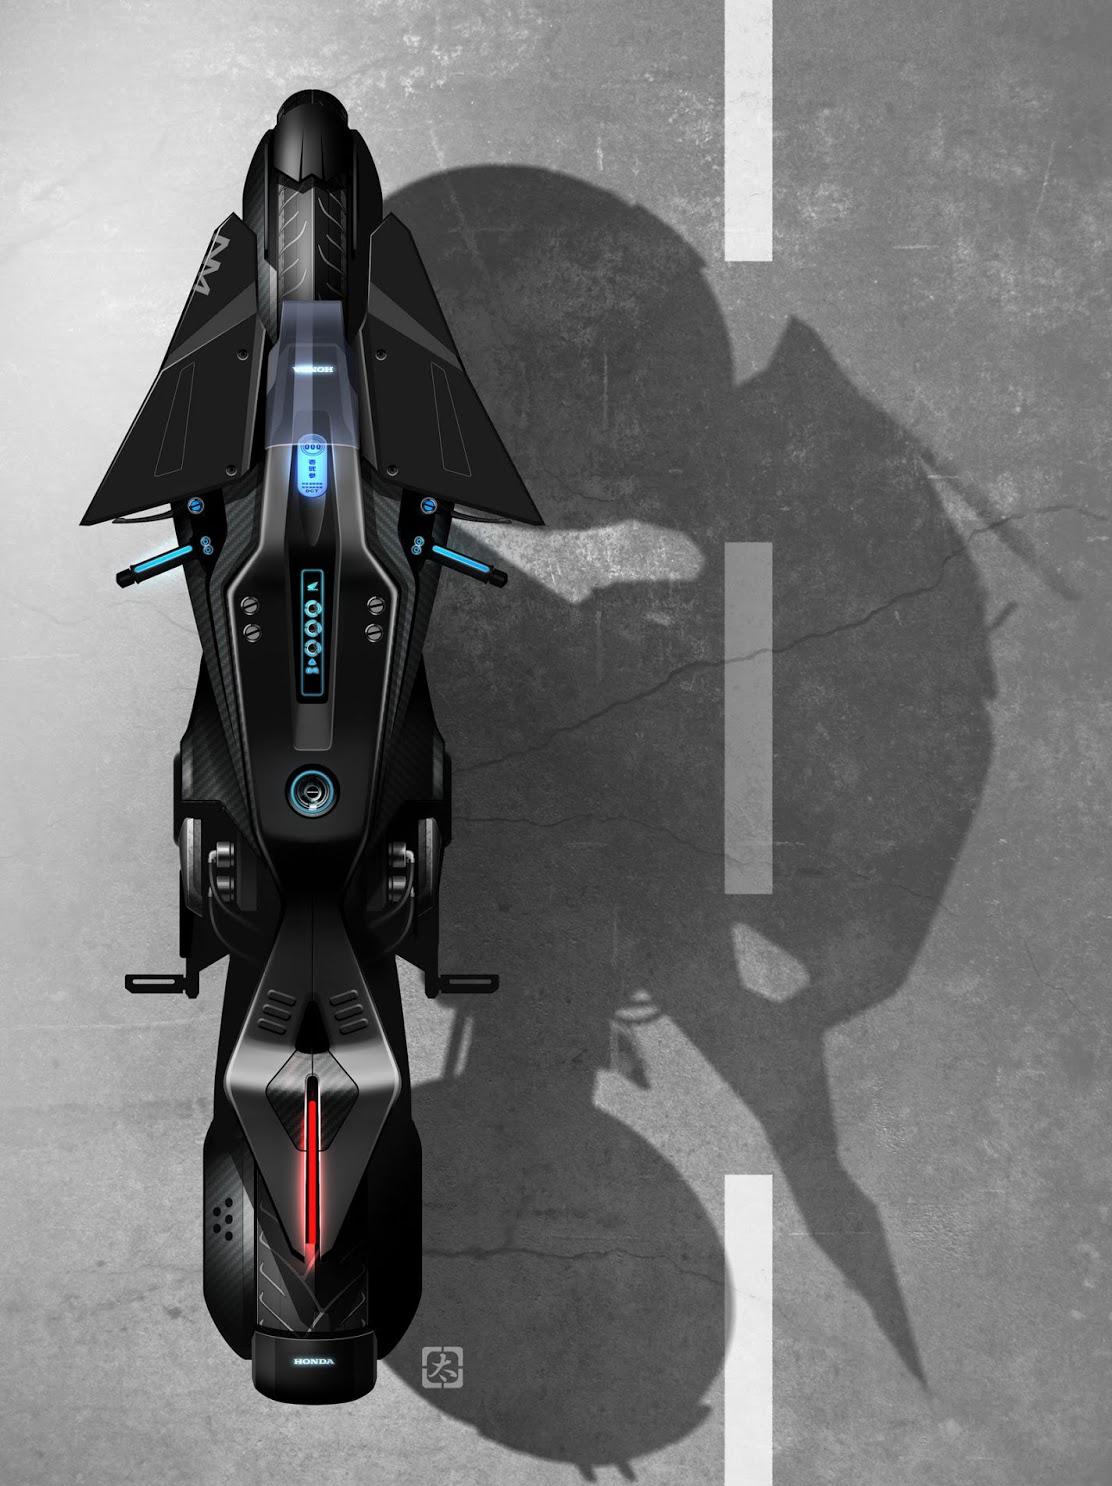 Scarlett_Johansson_Ghost_in_the_Shell_Honda_NM4_Concept_Moto-Mucci (3).jpg